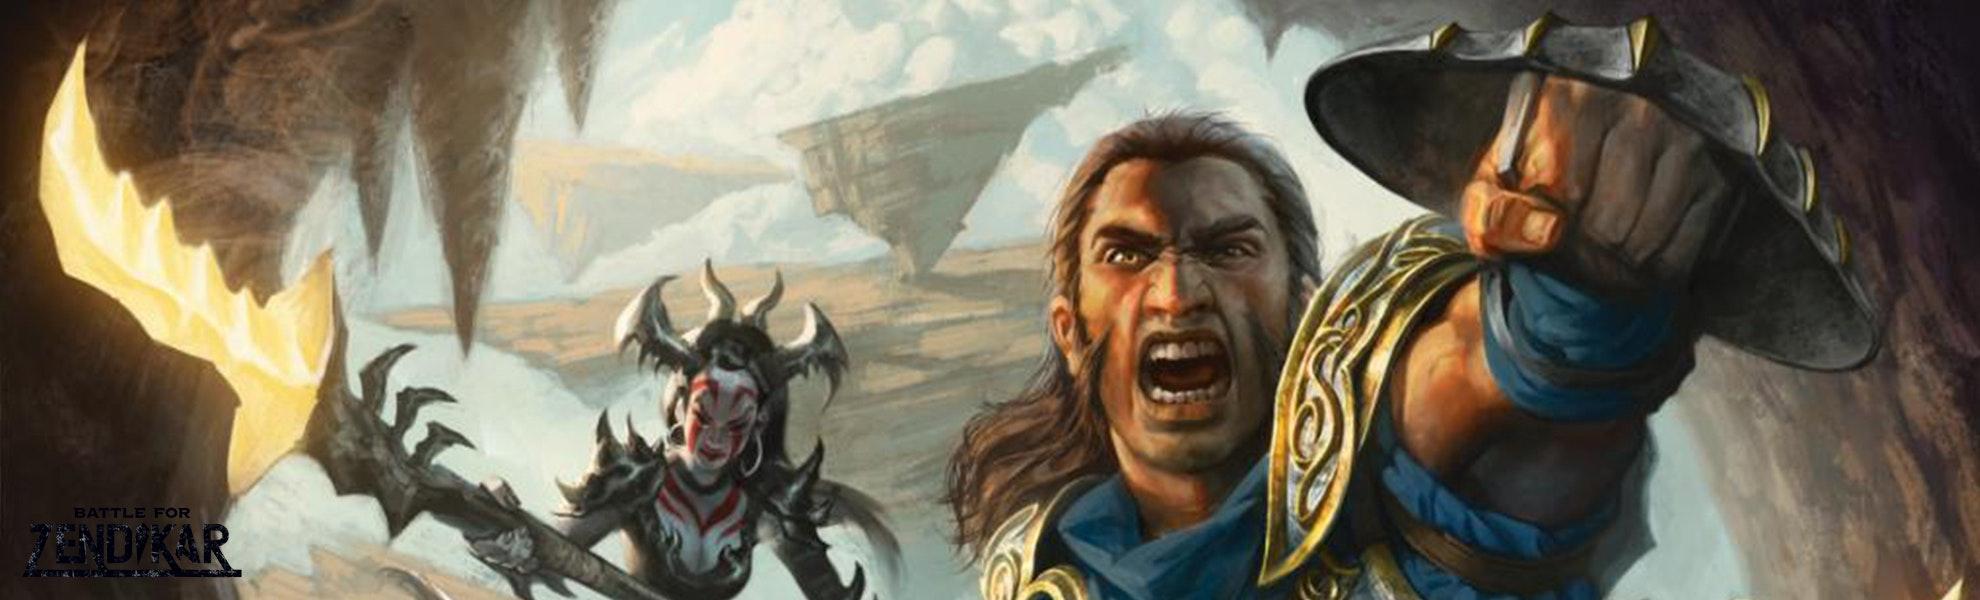 Battle for Zendikar Playset Pack (Presale)